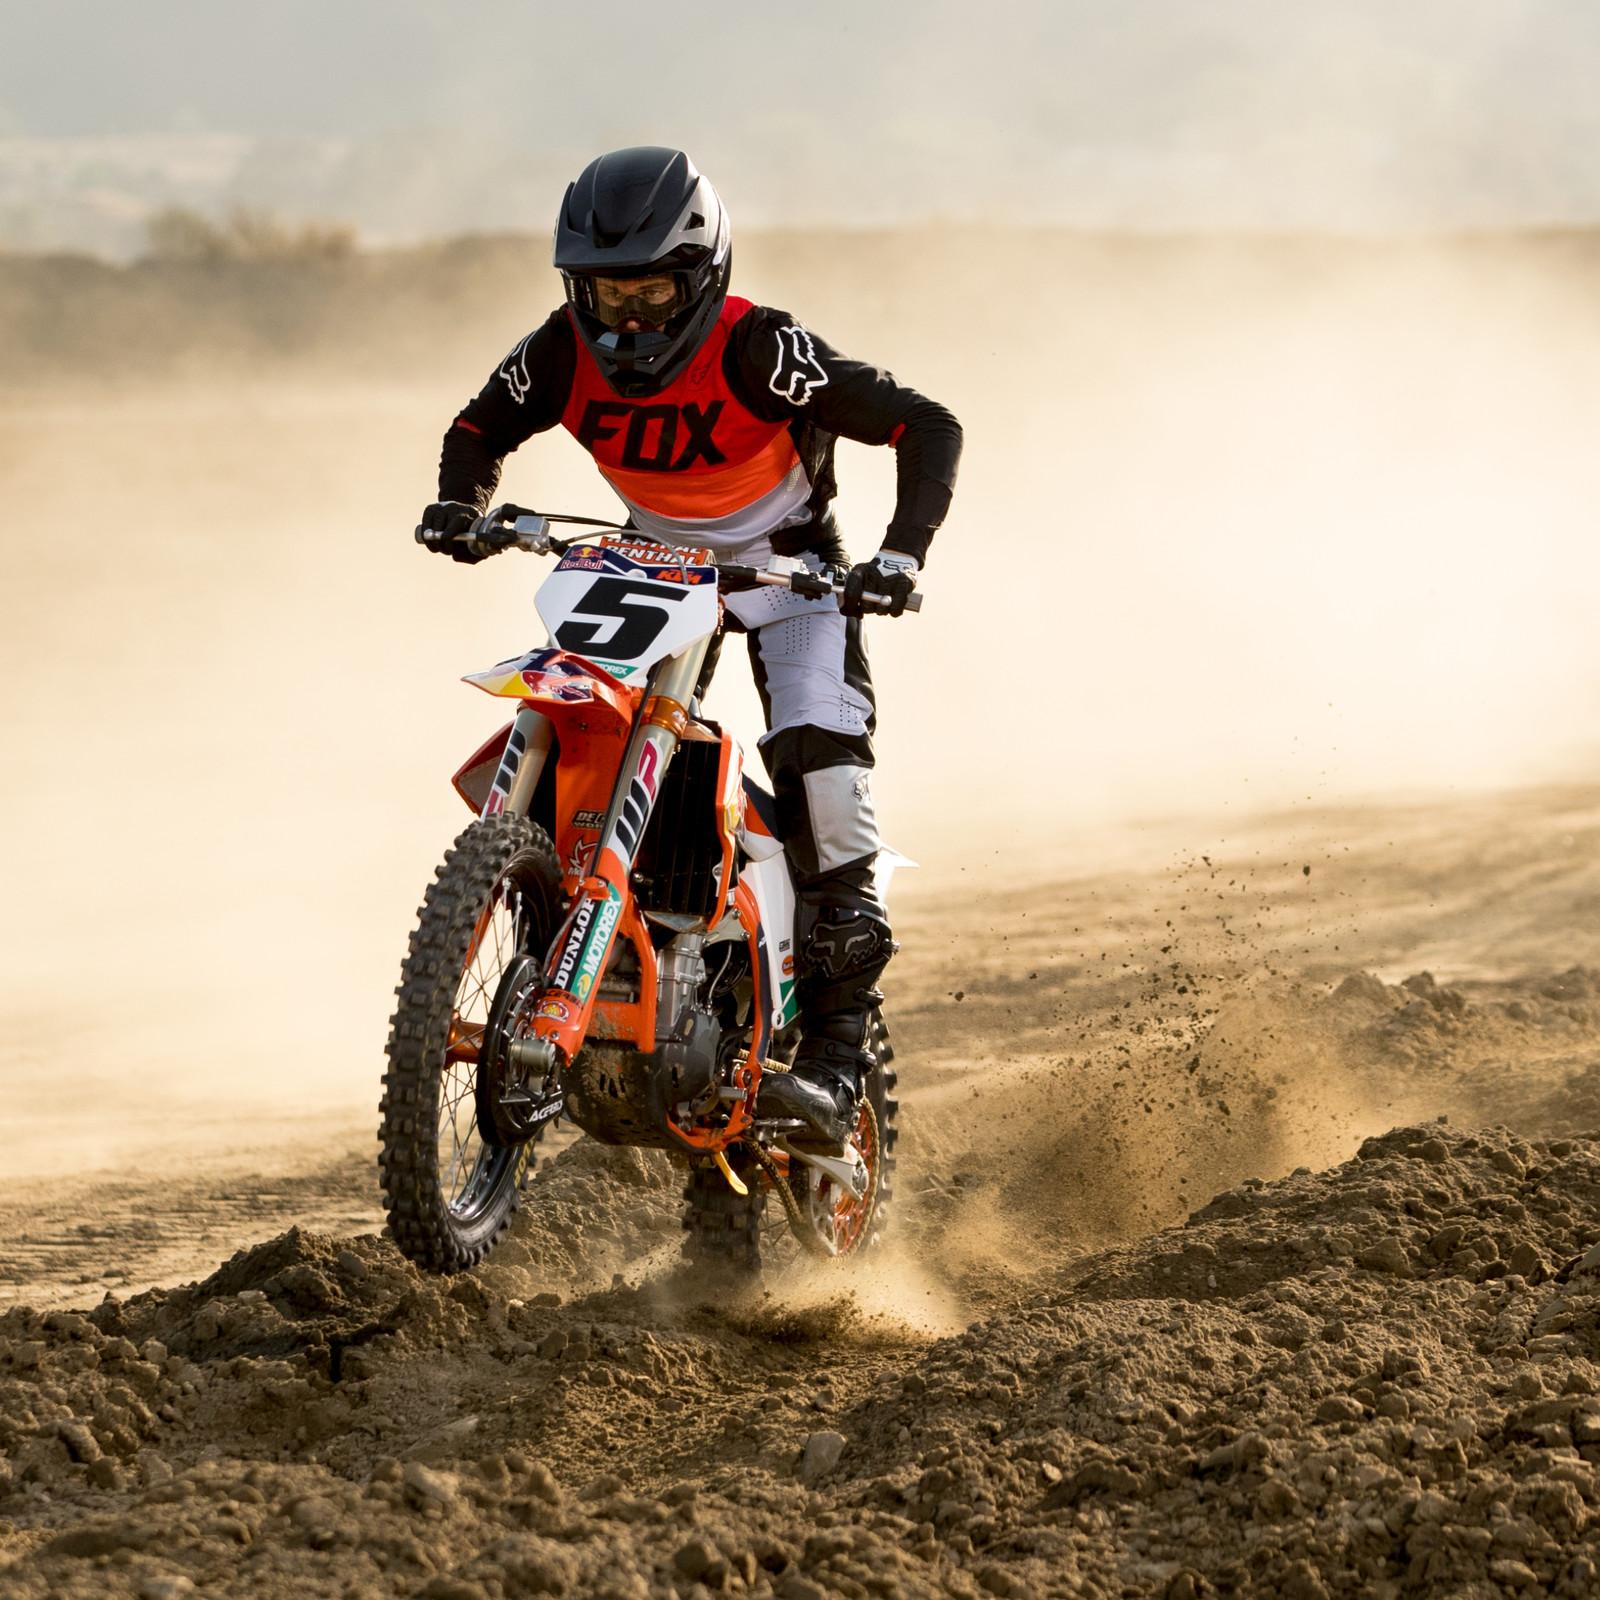 FOX RACING: FLEXAIR/360 RACEWEAR COLLECTIONS OFFICIAL VIDEO